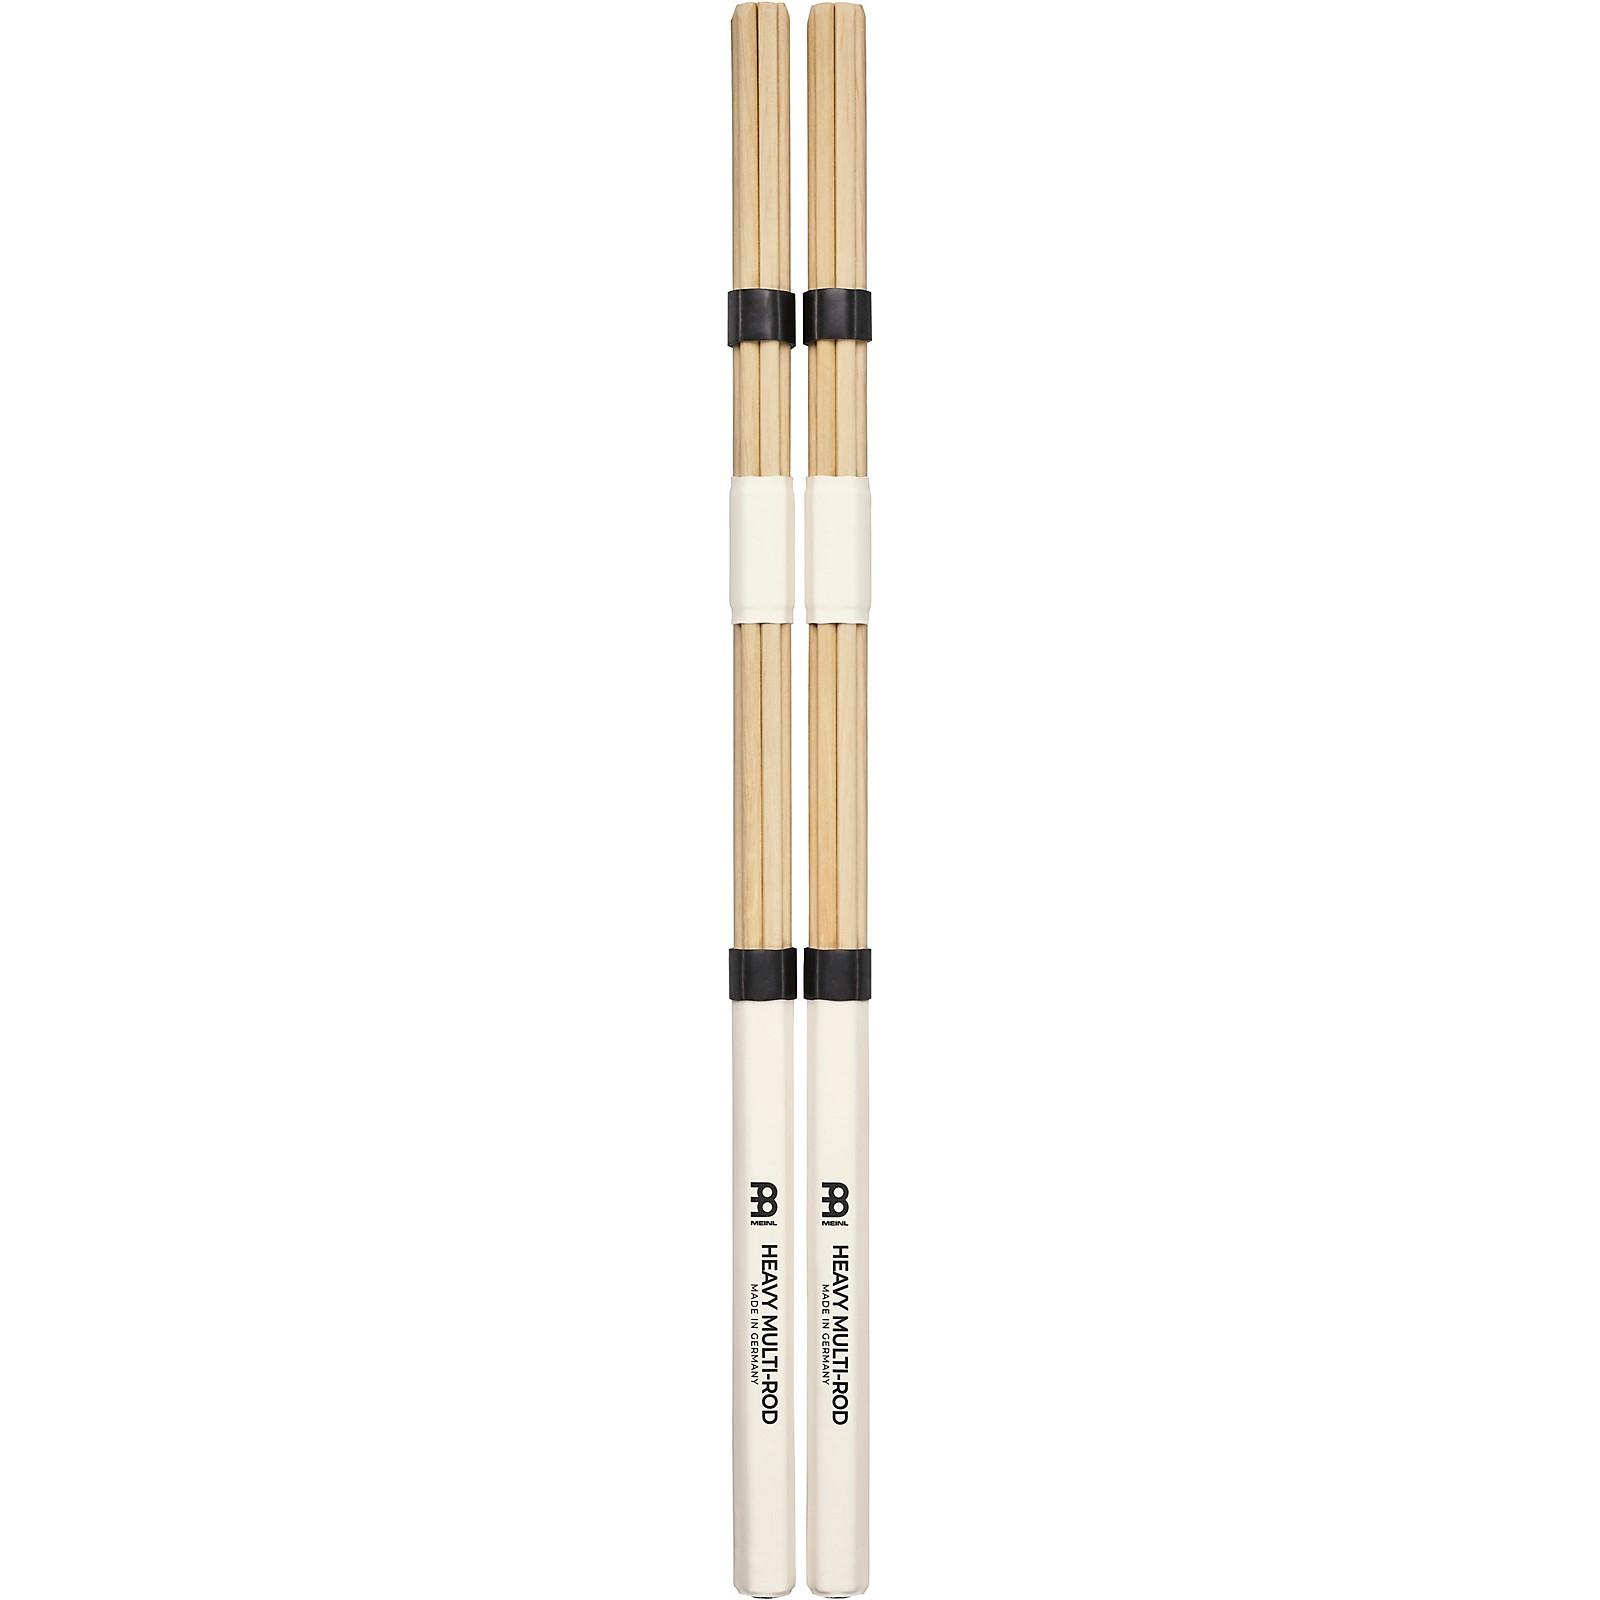 Meinl Stick & Brush Heavy Multi-Rods